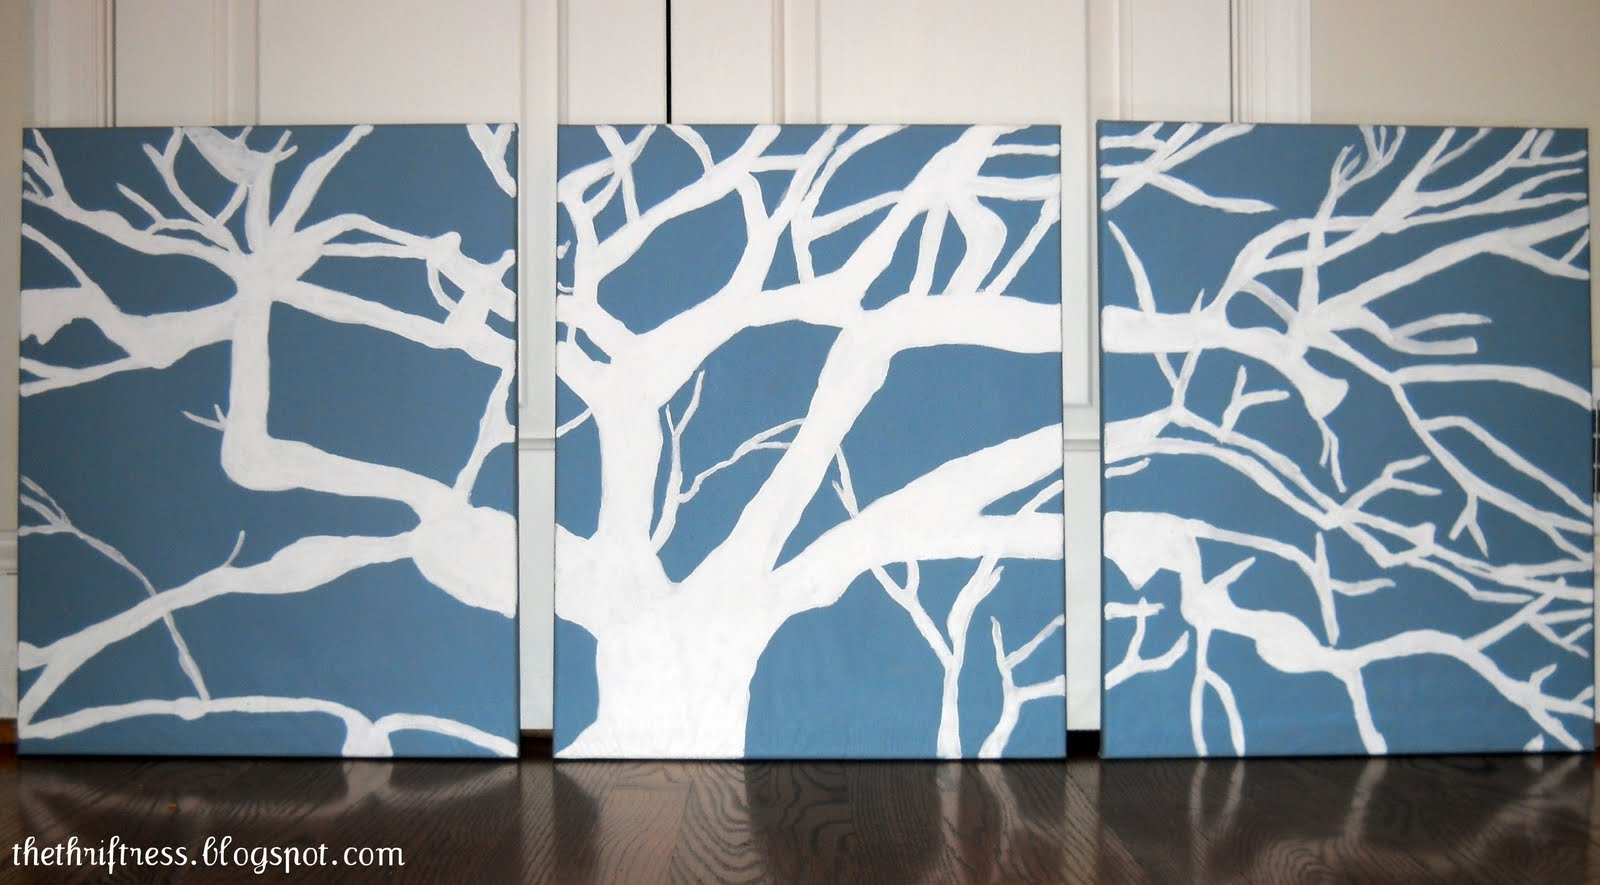 Diy Wall Art Masterpiece – Dma Homes | #81925 Regarding Current Homemade Canvas Wall Art (View 10 of 15)